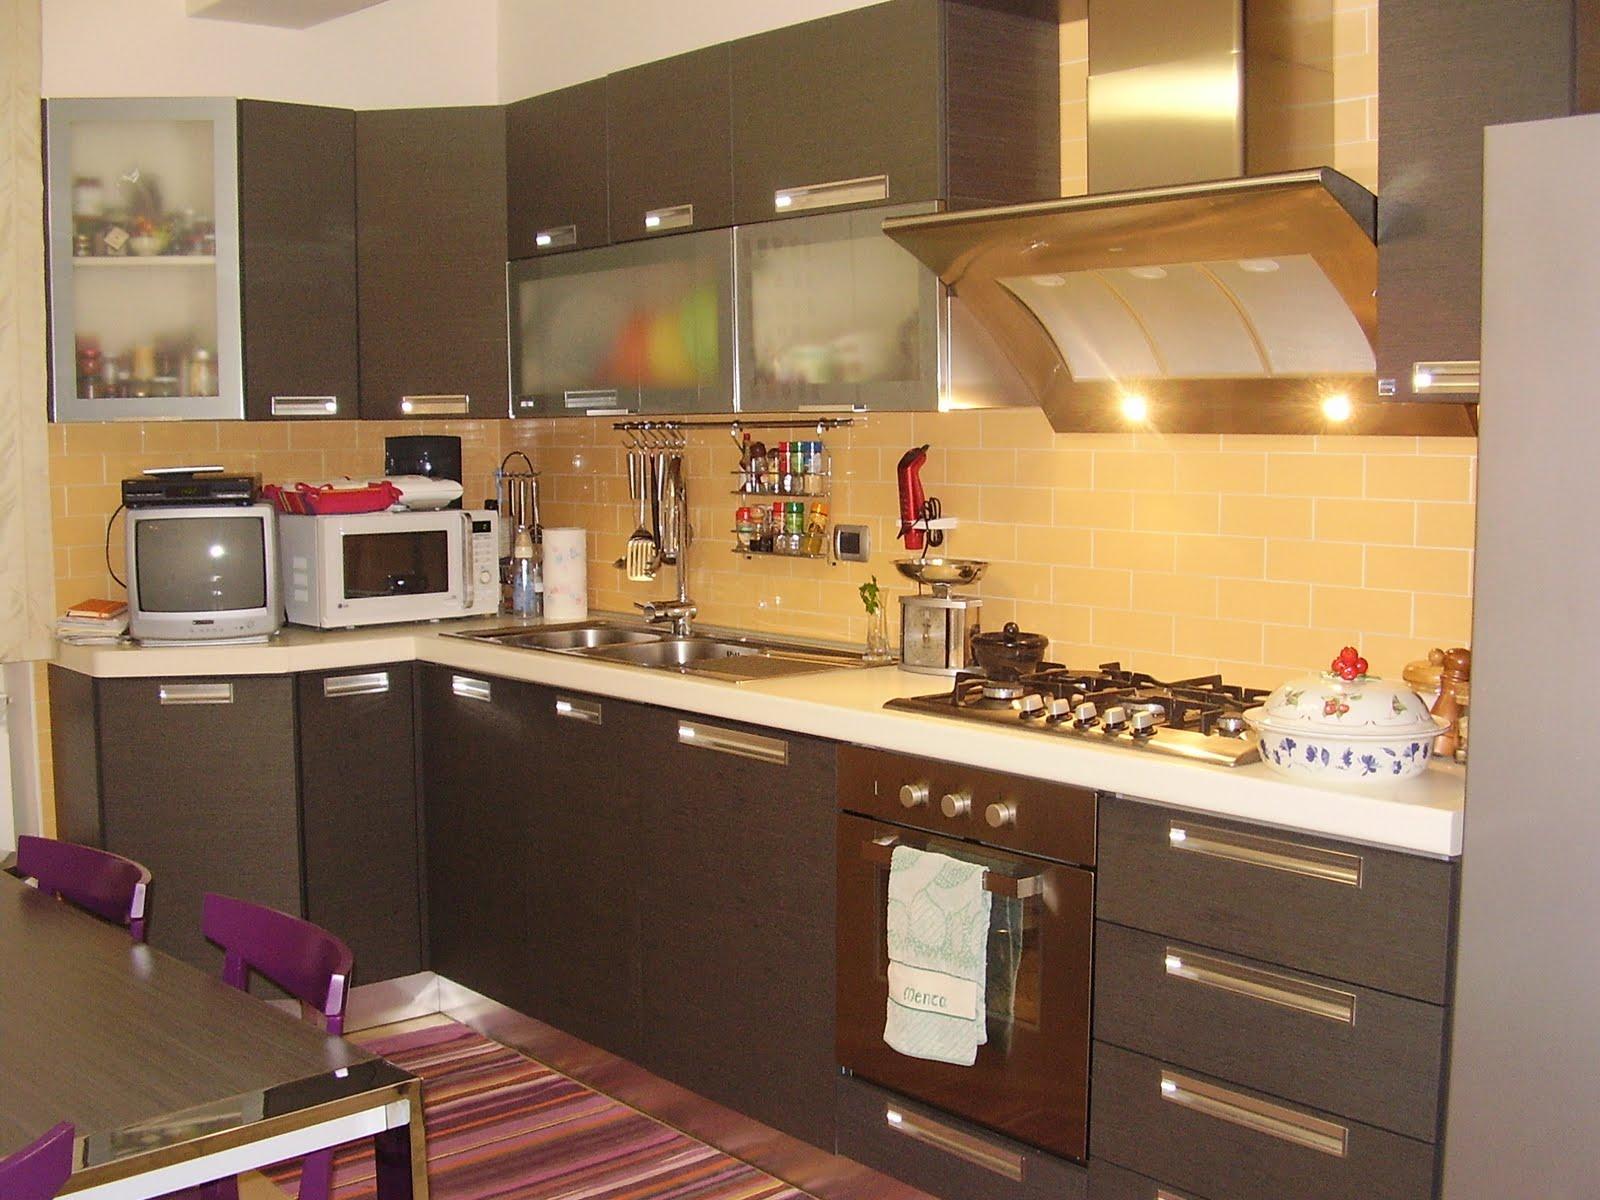 Stunning piastrelle cucina prezzi ideas design ideas